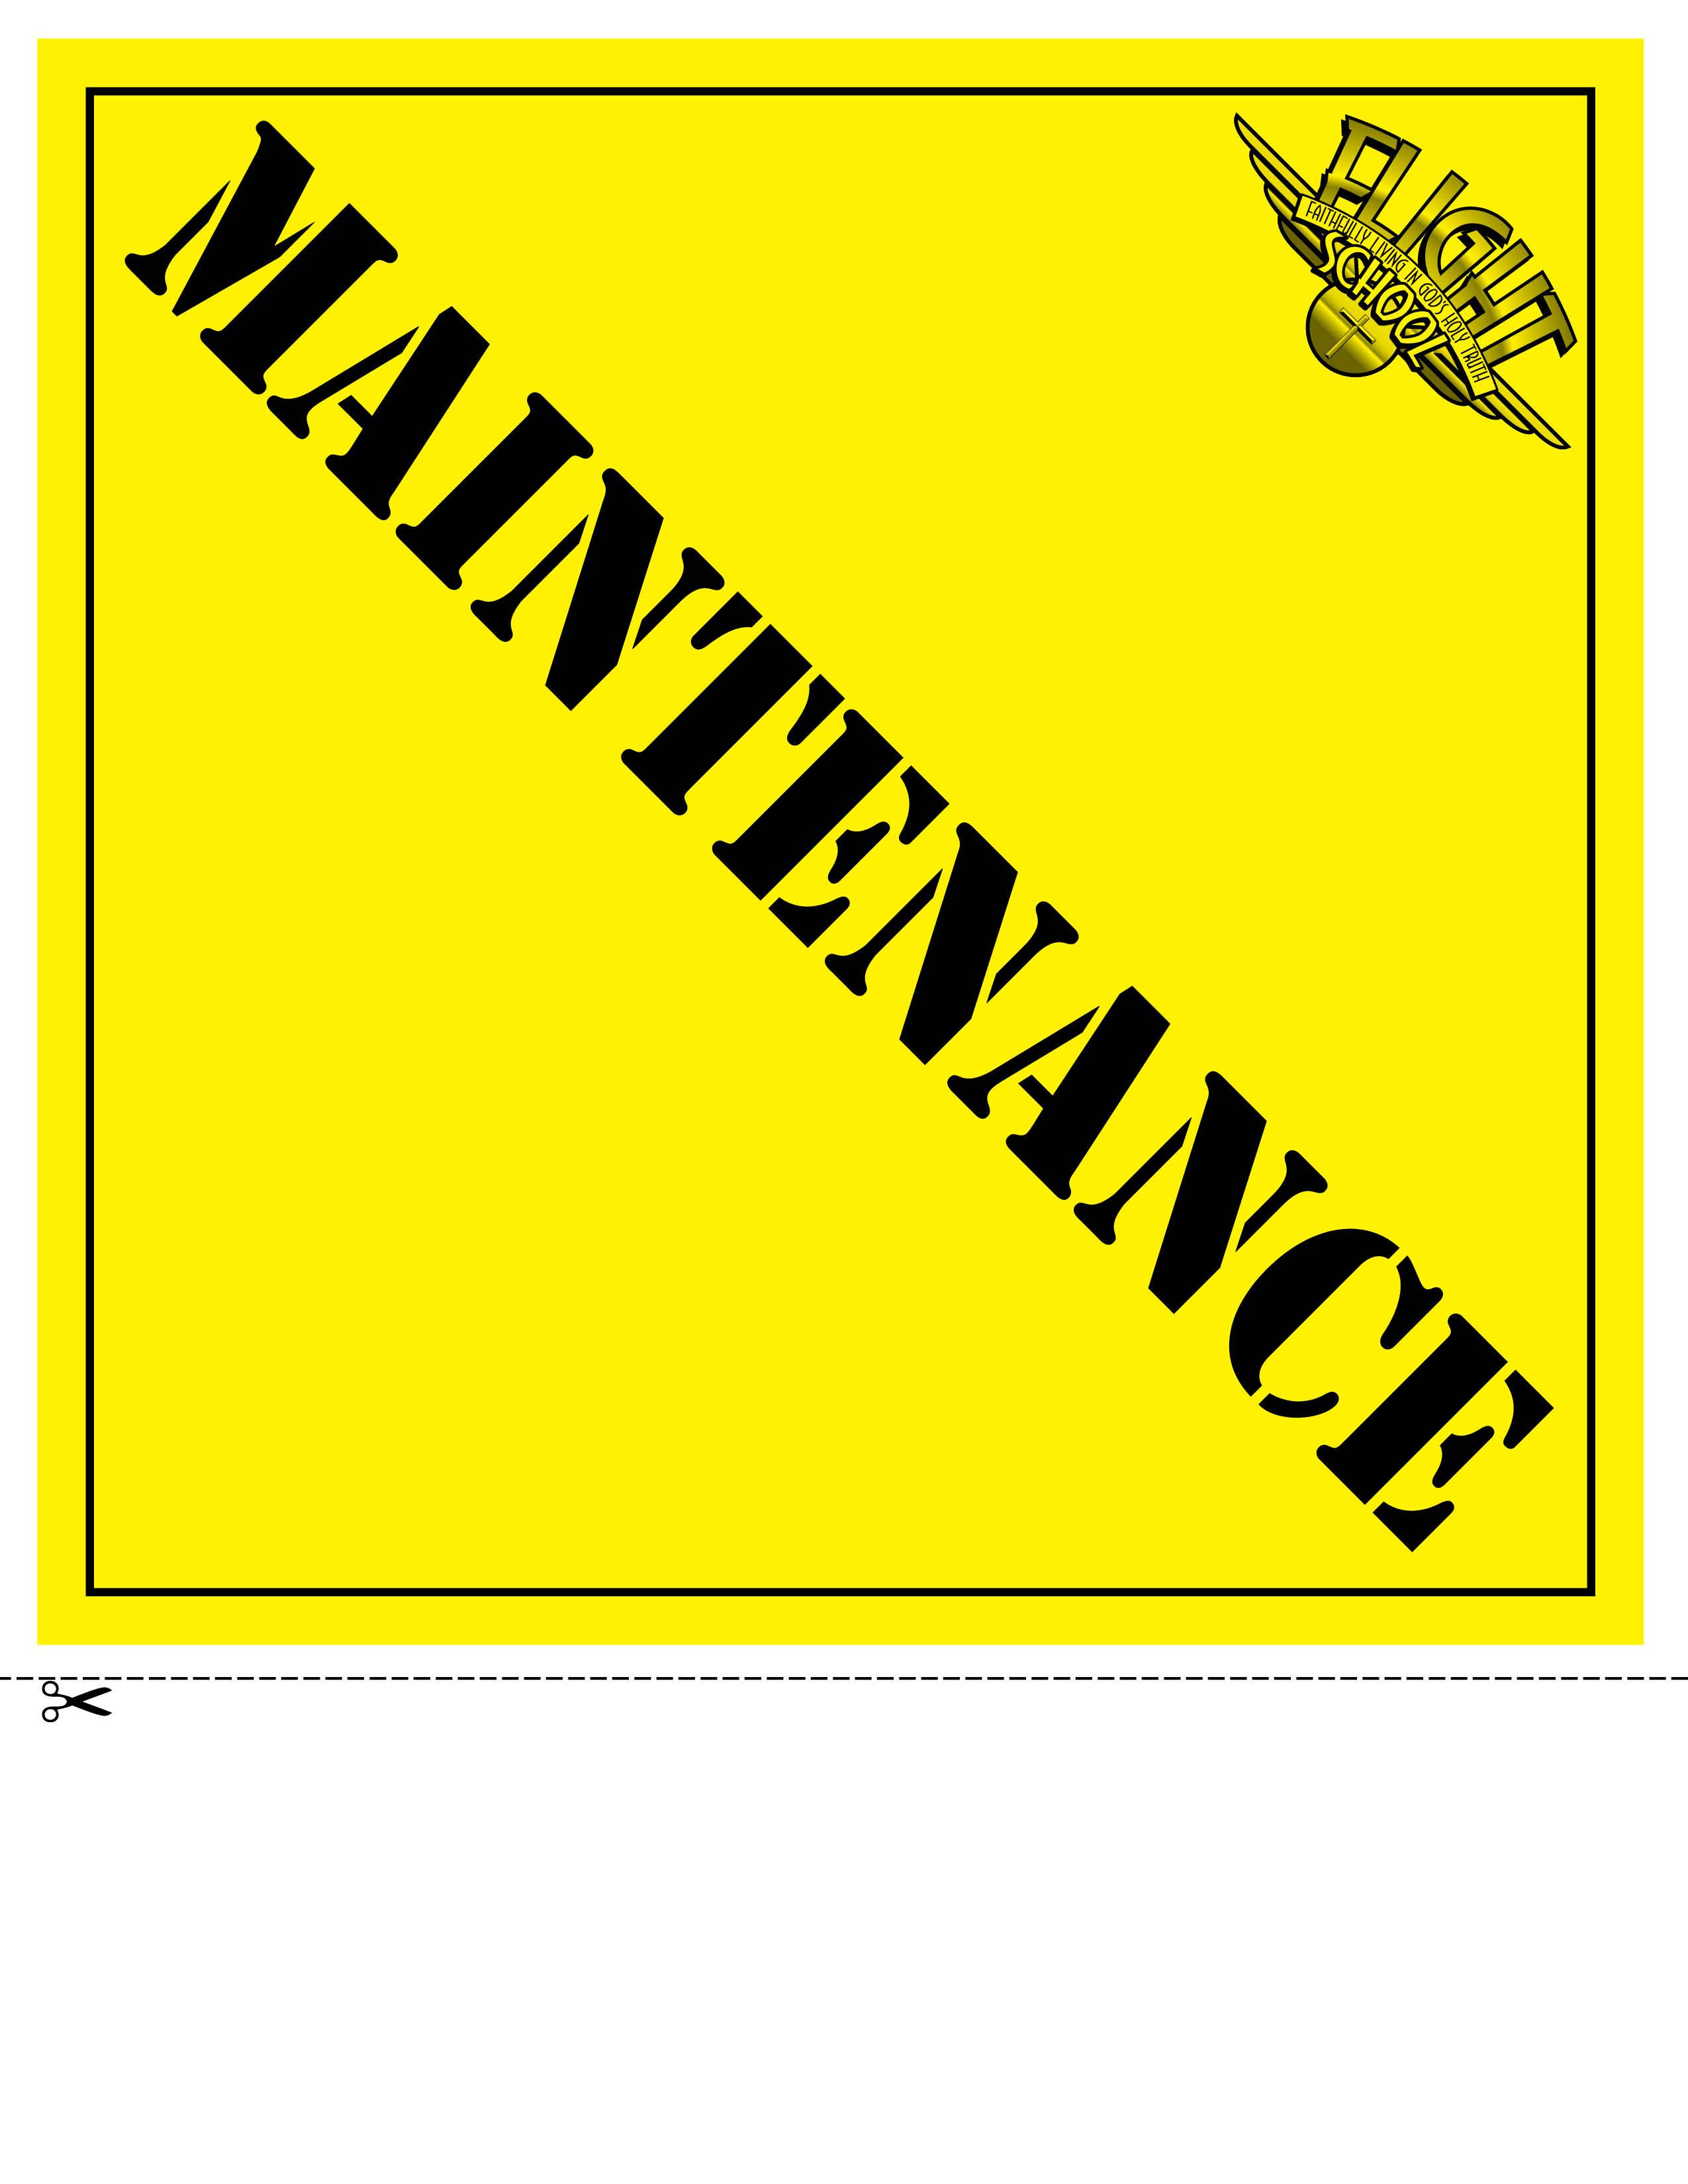 Maintenance Pictures Clip Art Http Truthquest Net Flight School